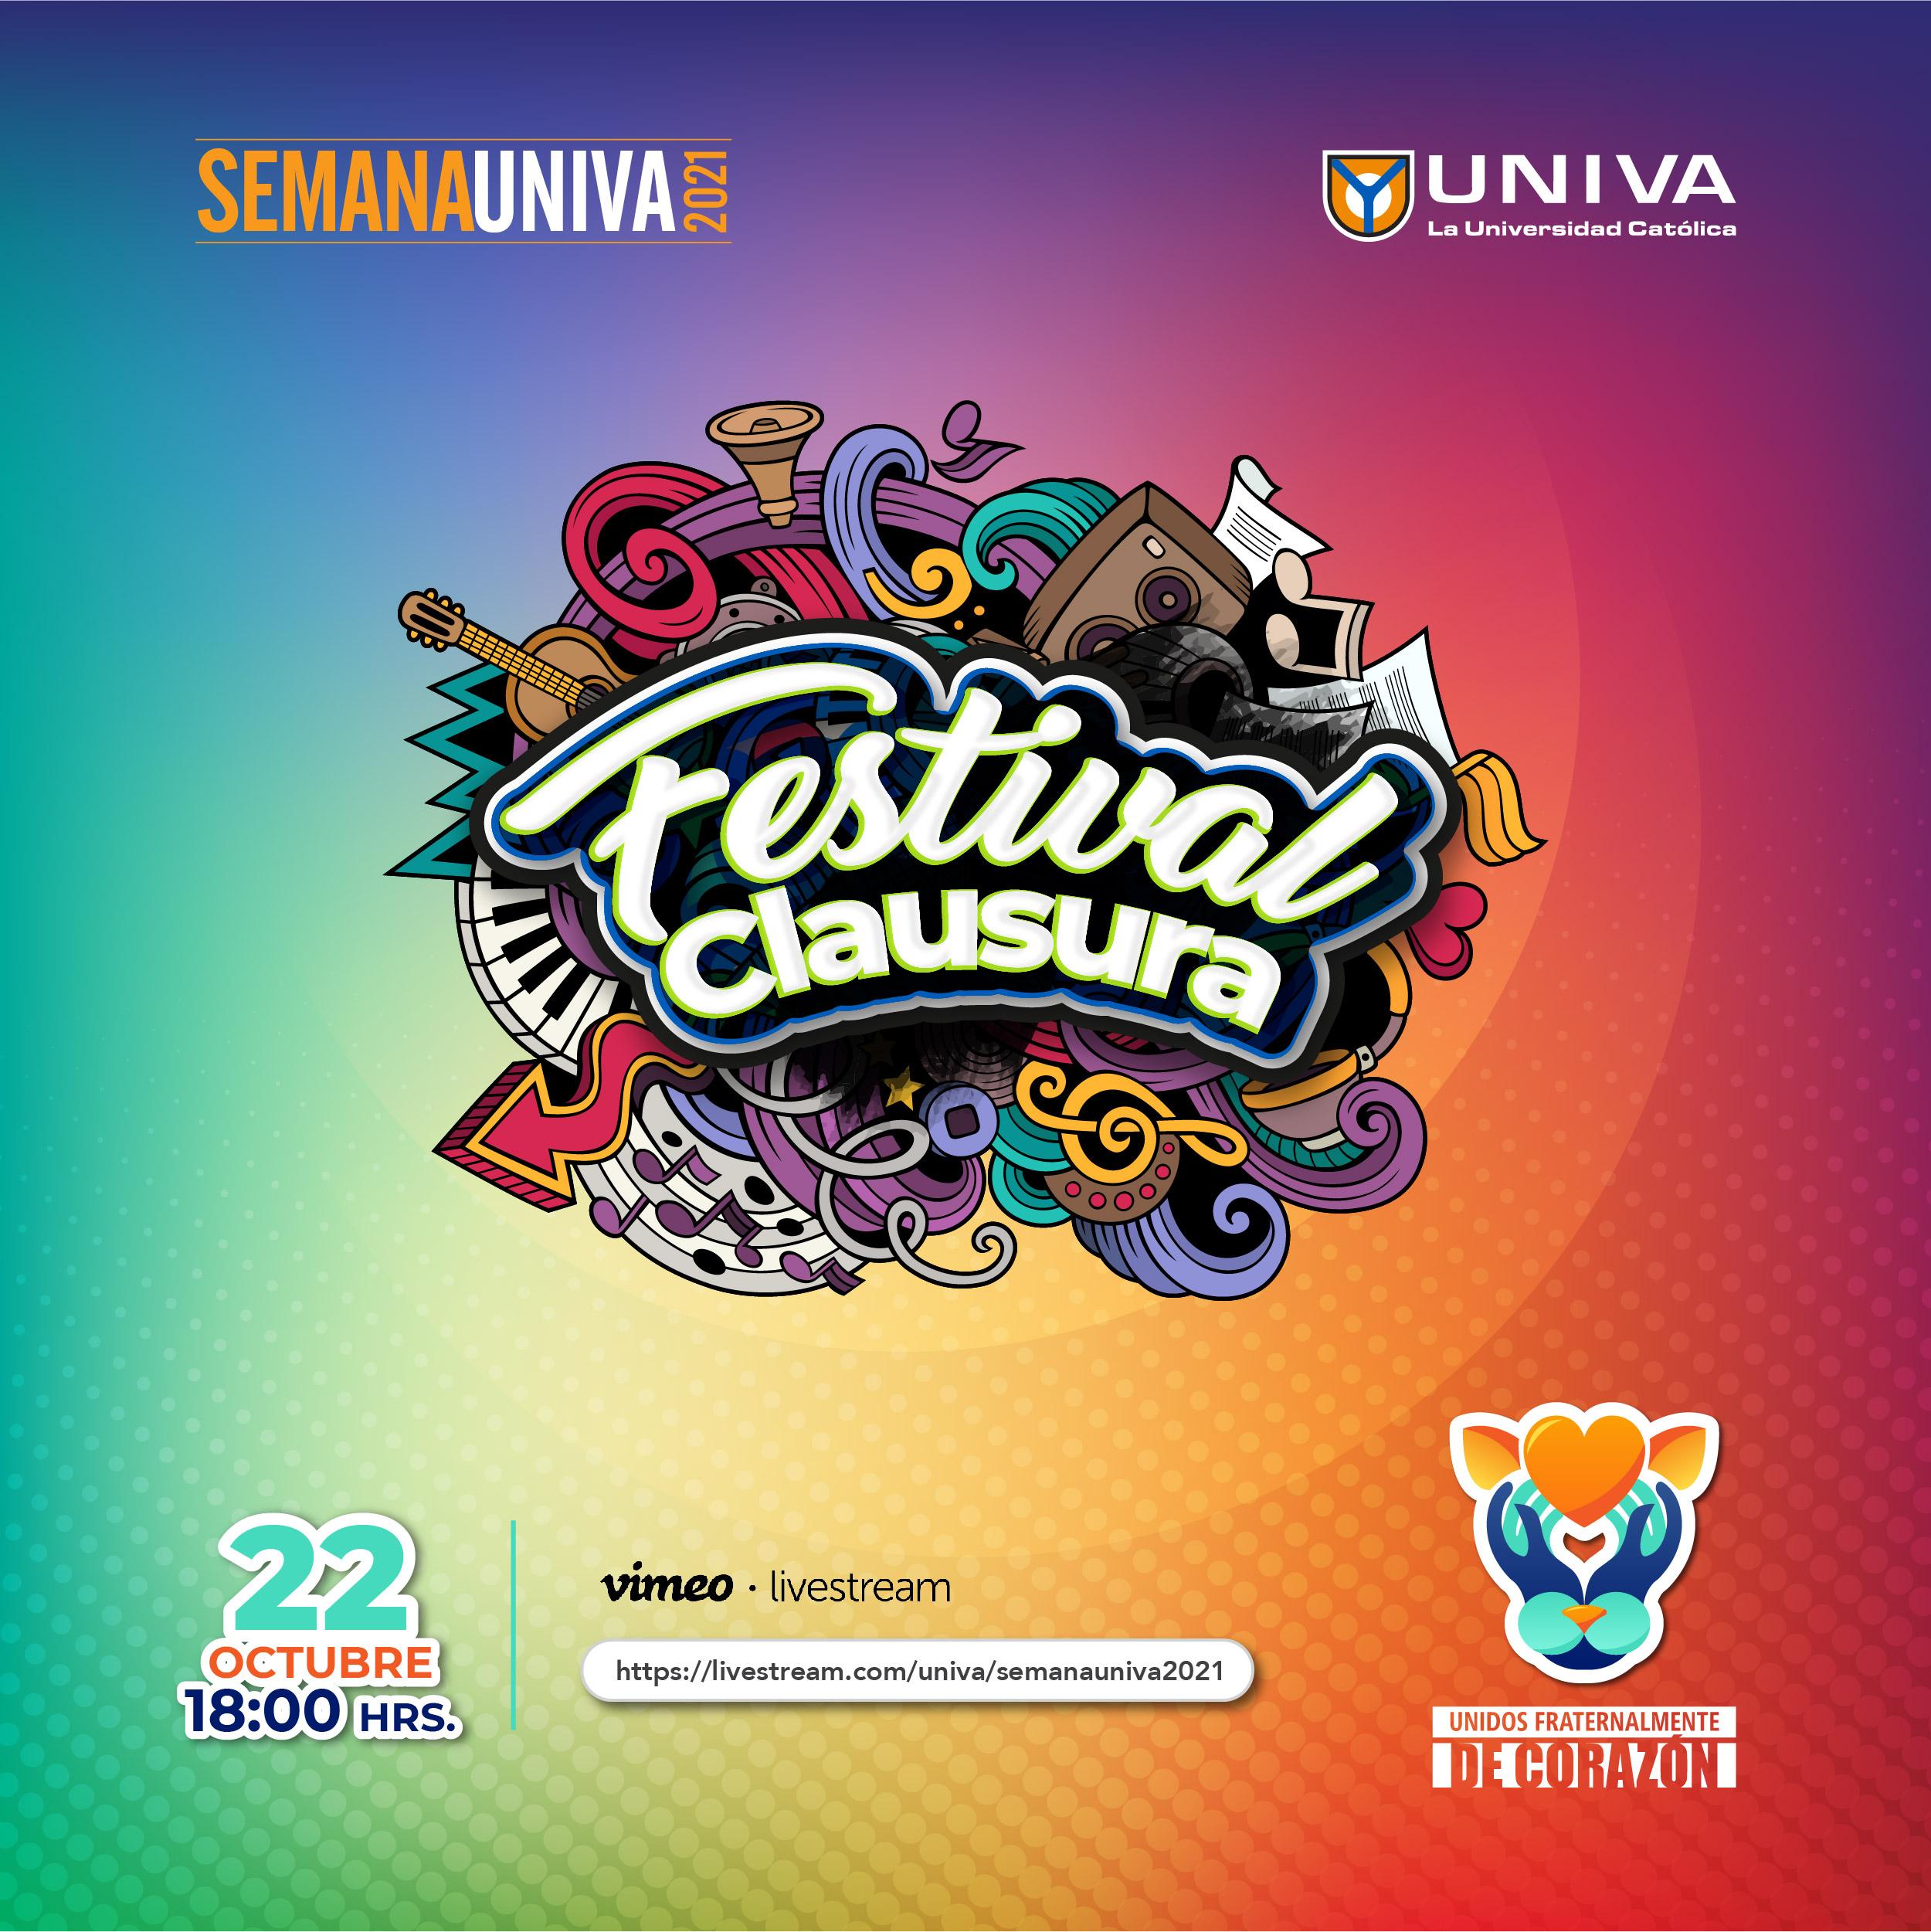 Festival Clausura Semana UNIVA 2021